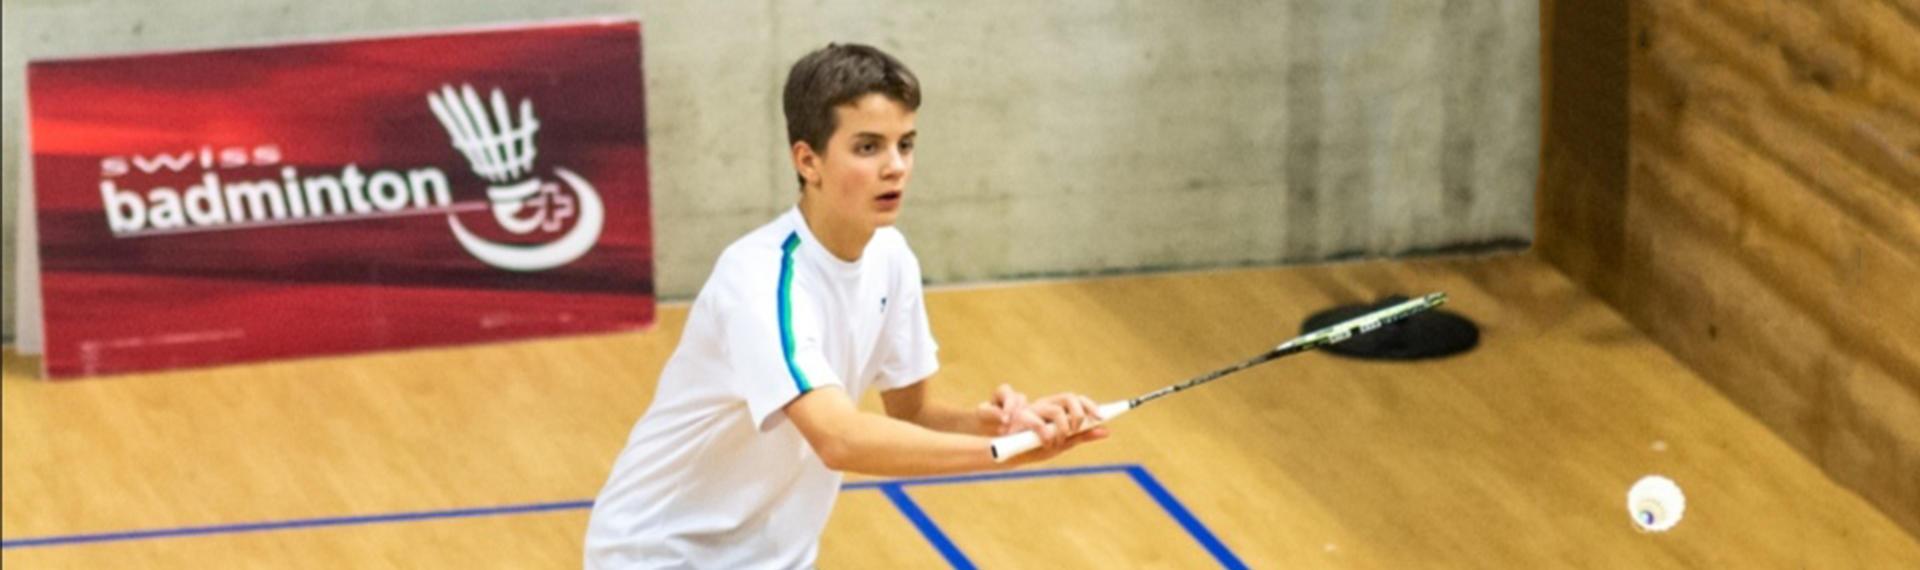 Nicolas Franconville, badminton : banque privée Bonhôte